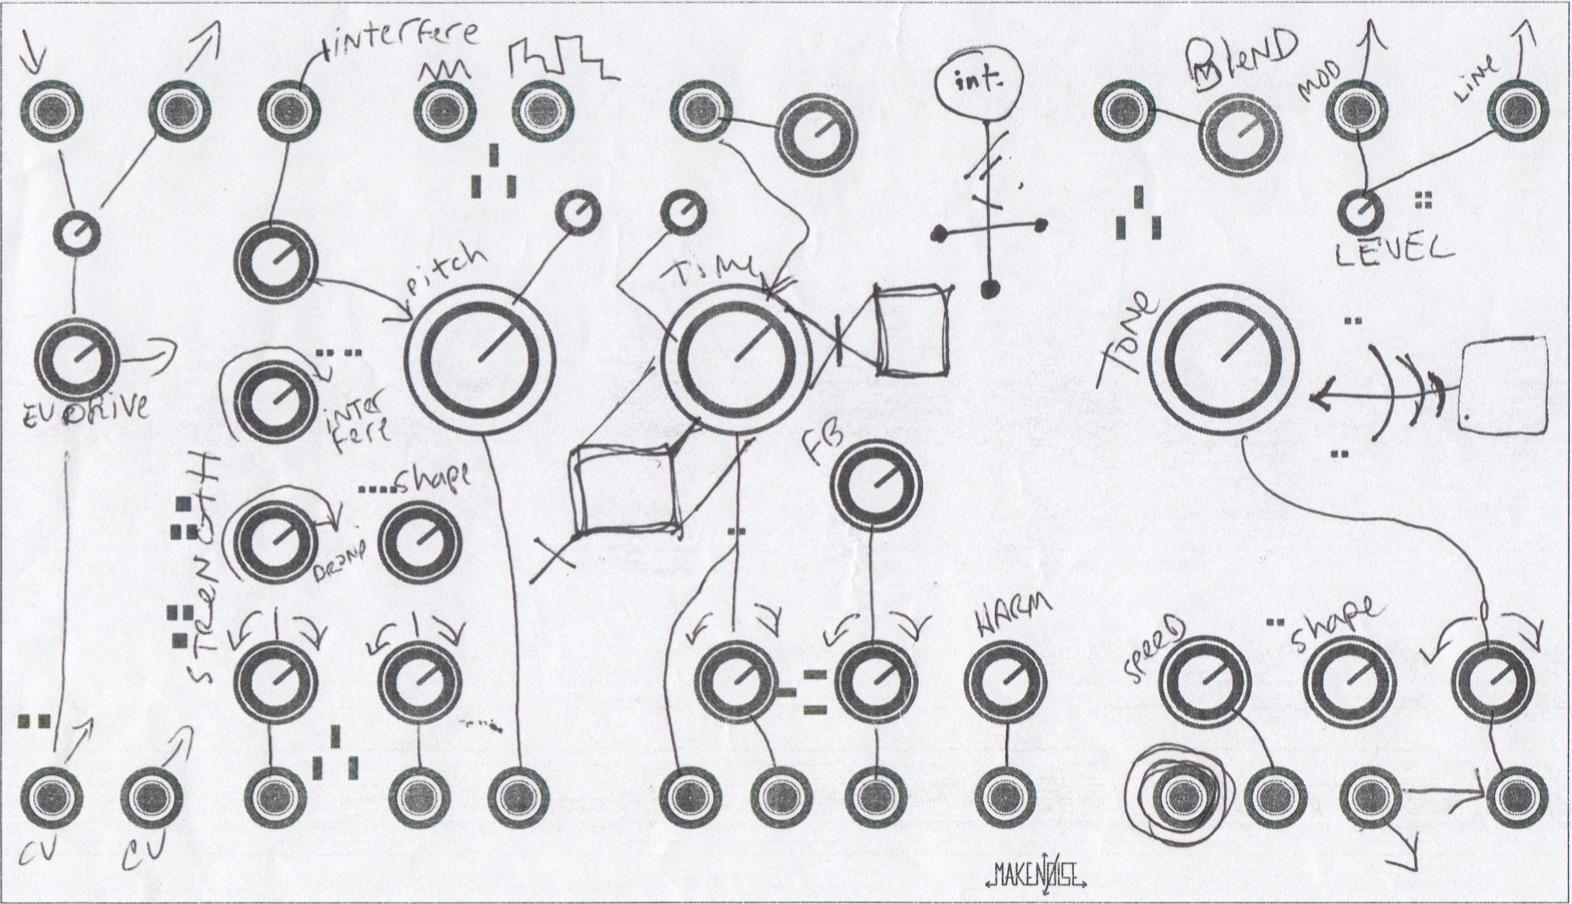 Make Noise // Strega // Tony Rolando // Interface Study